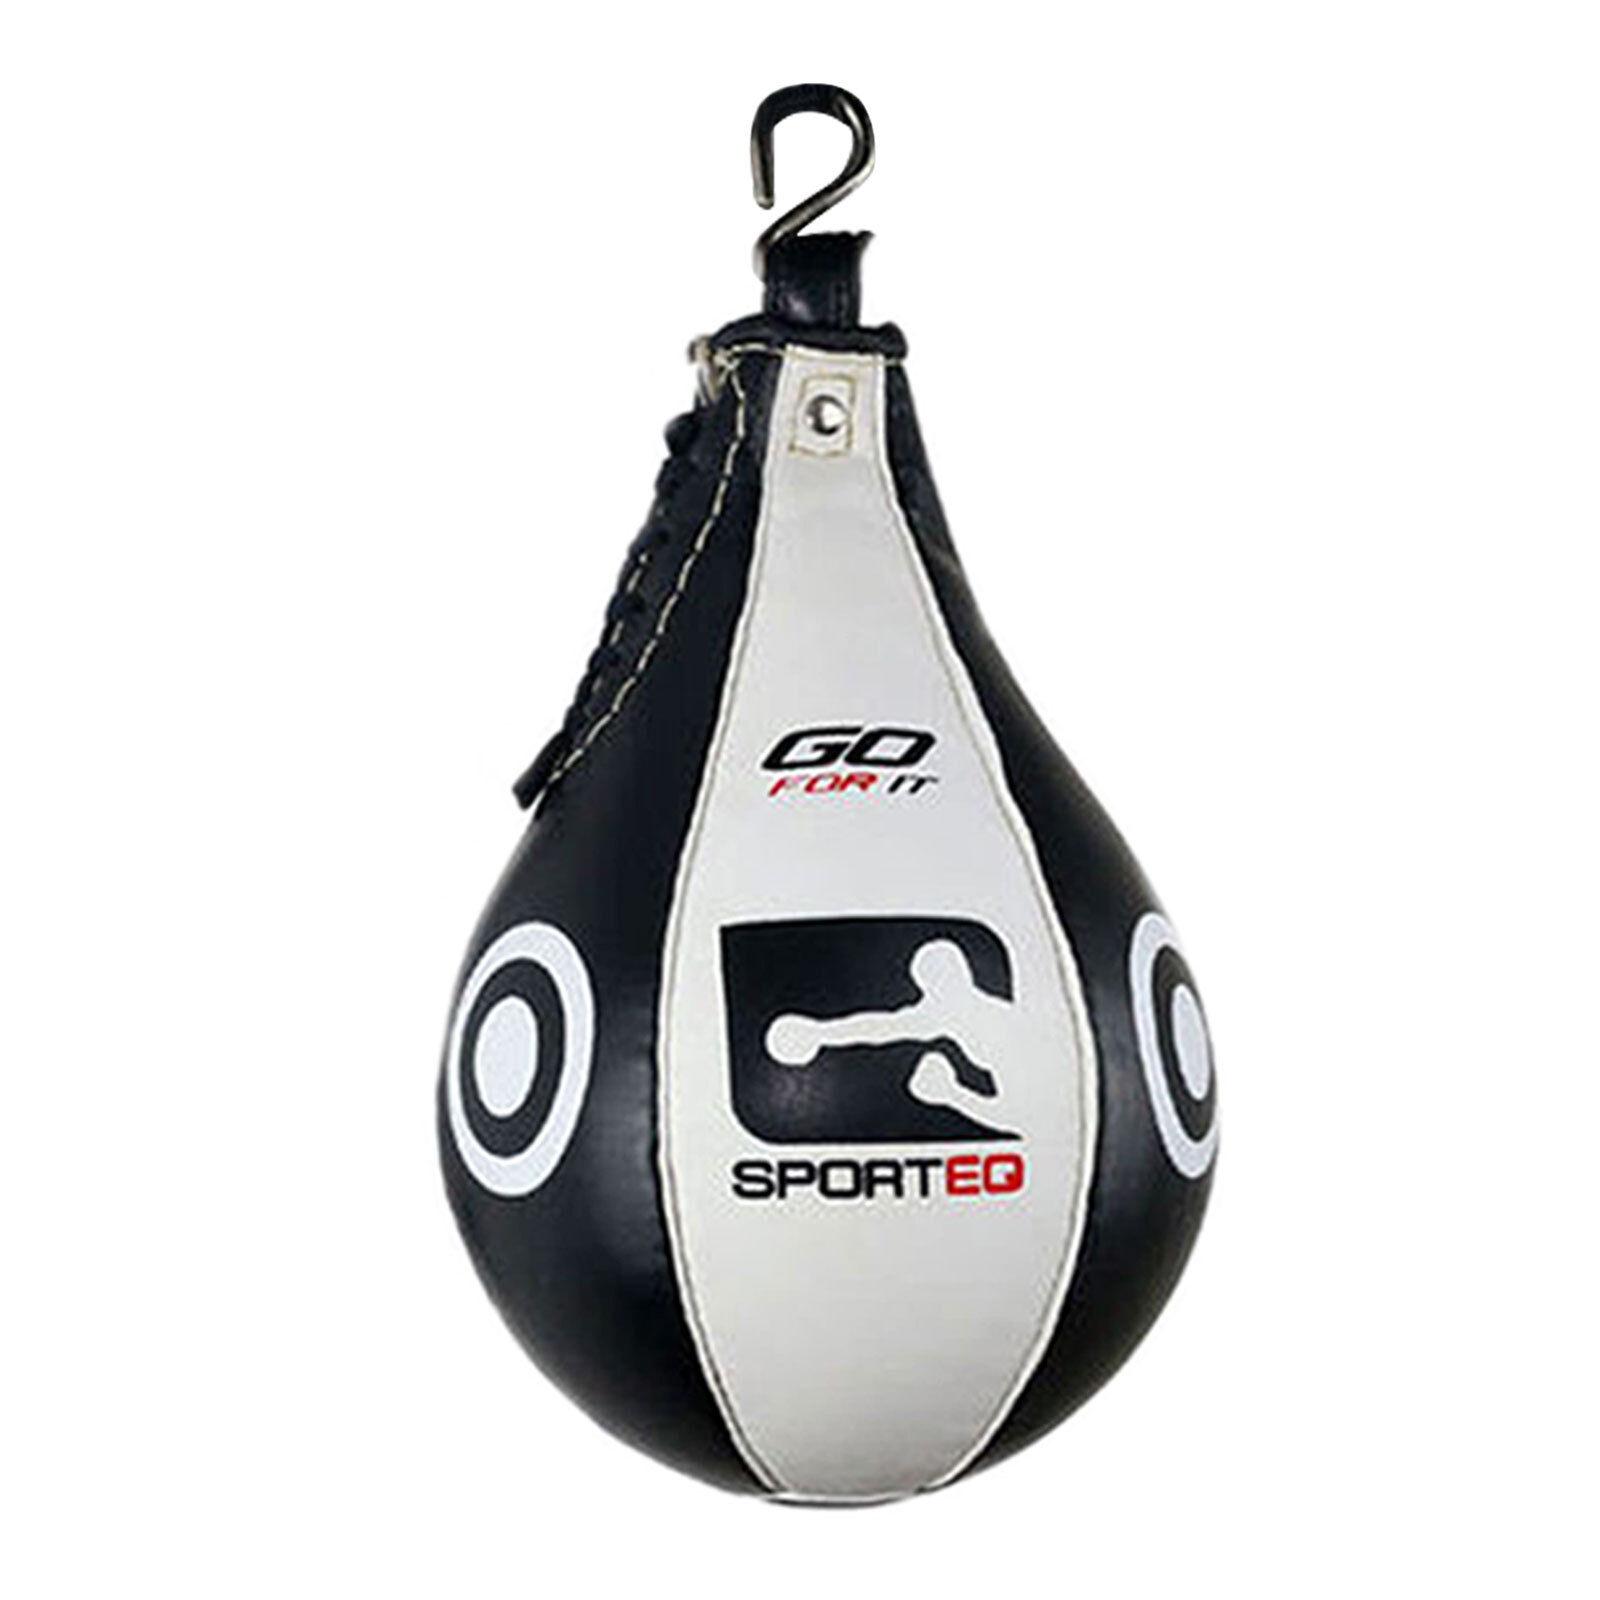 Sporteq Sporteq Sporteq Speedball Plateau Set, Verstellbar Bügel Boxhandschuhe, Boxbirne c7c131